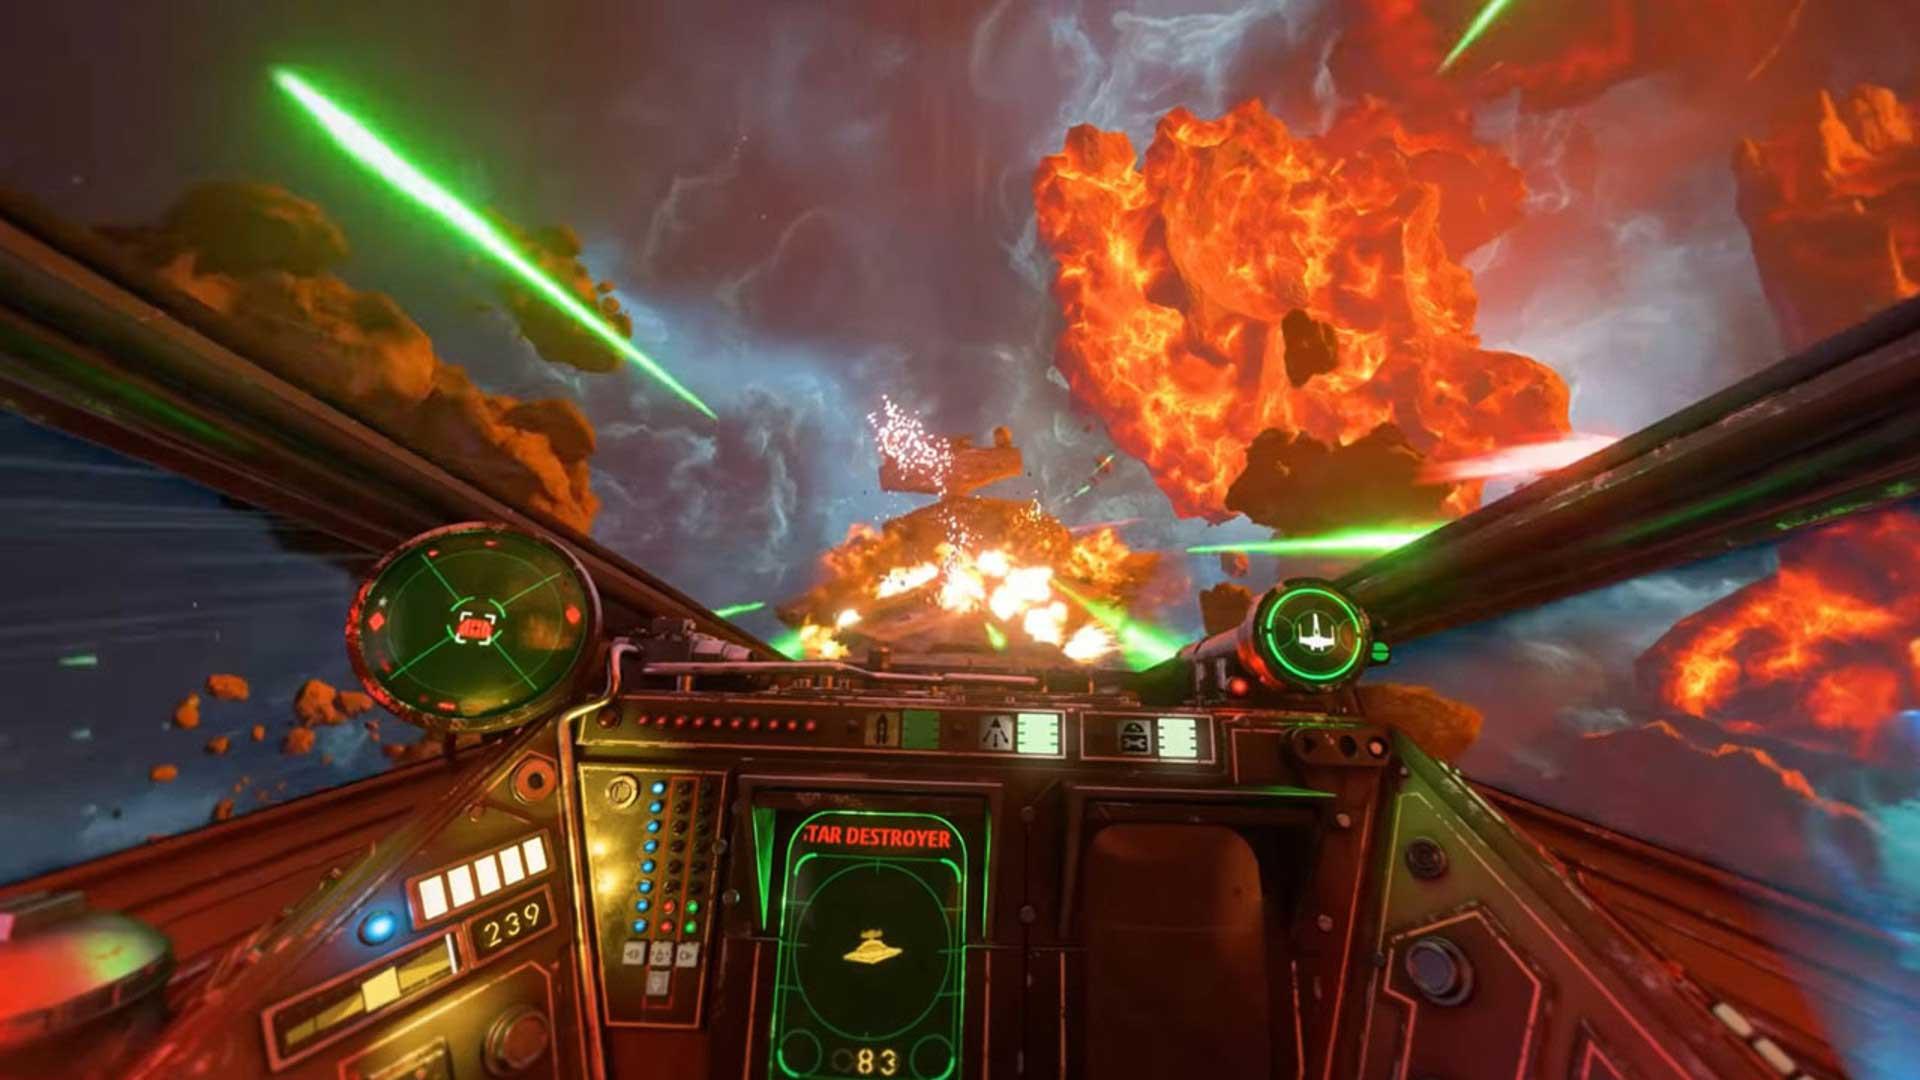 EA Games Next-Gen